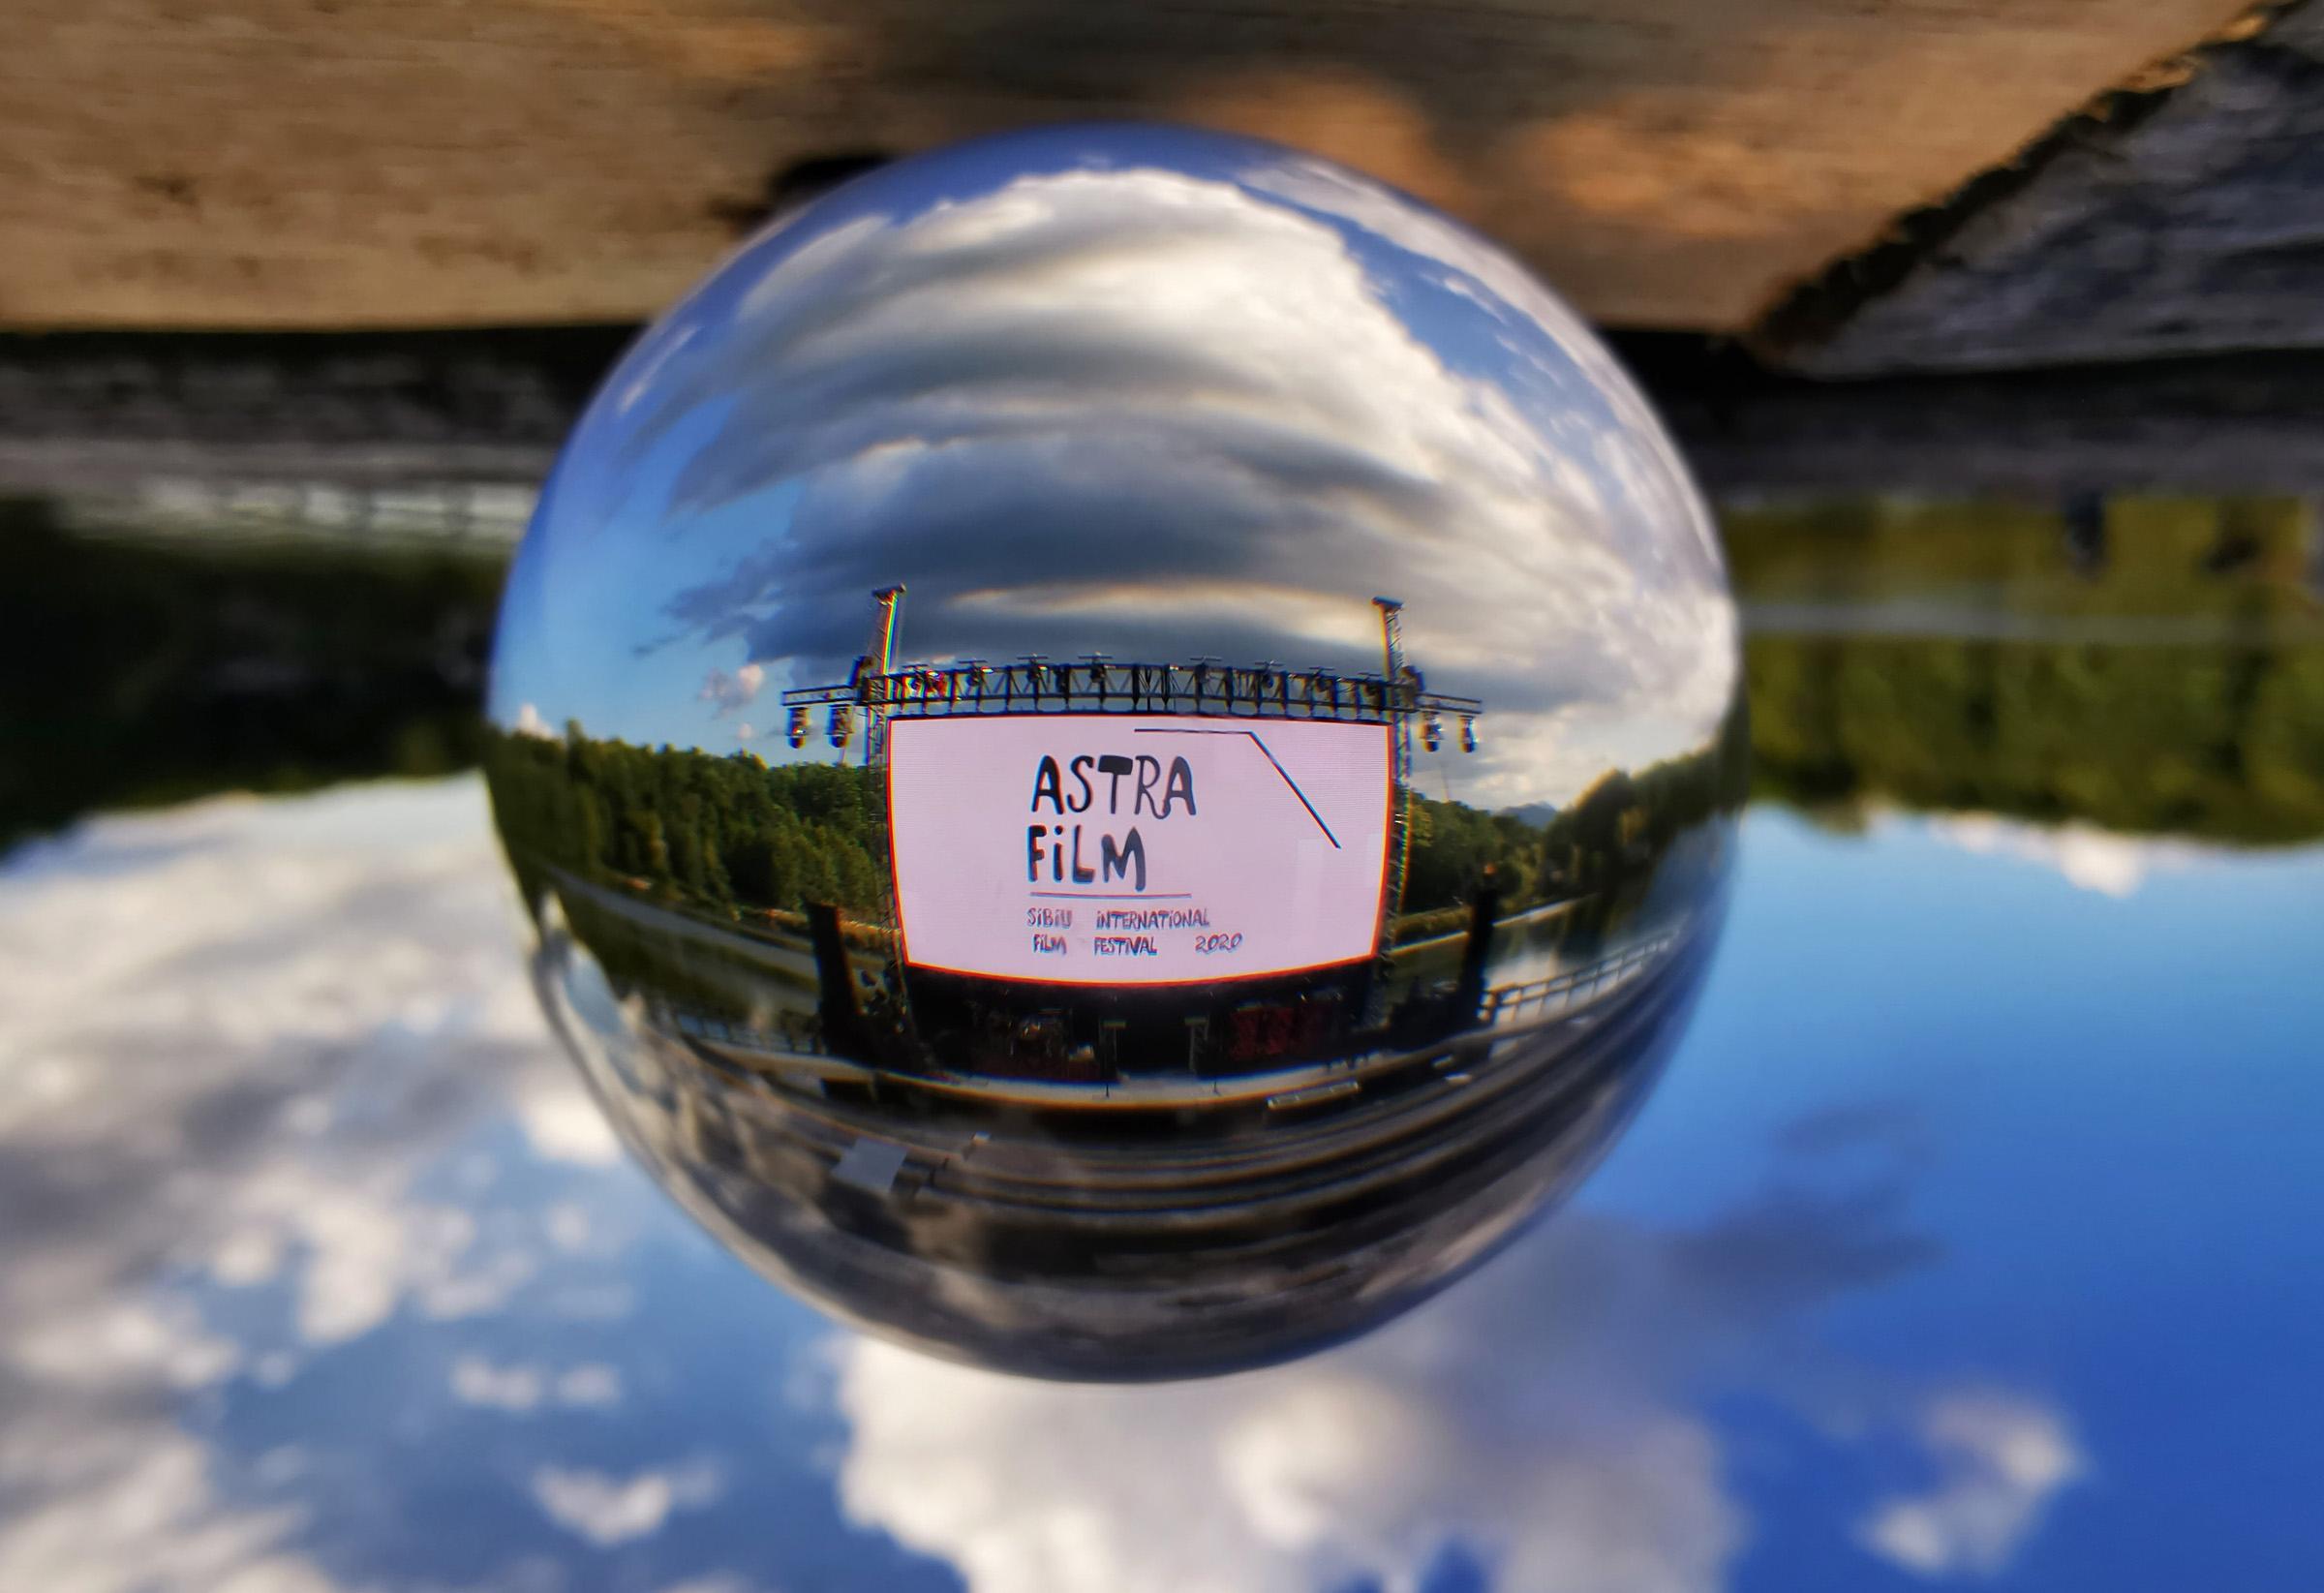 Astra Film